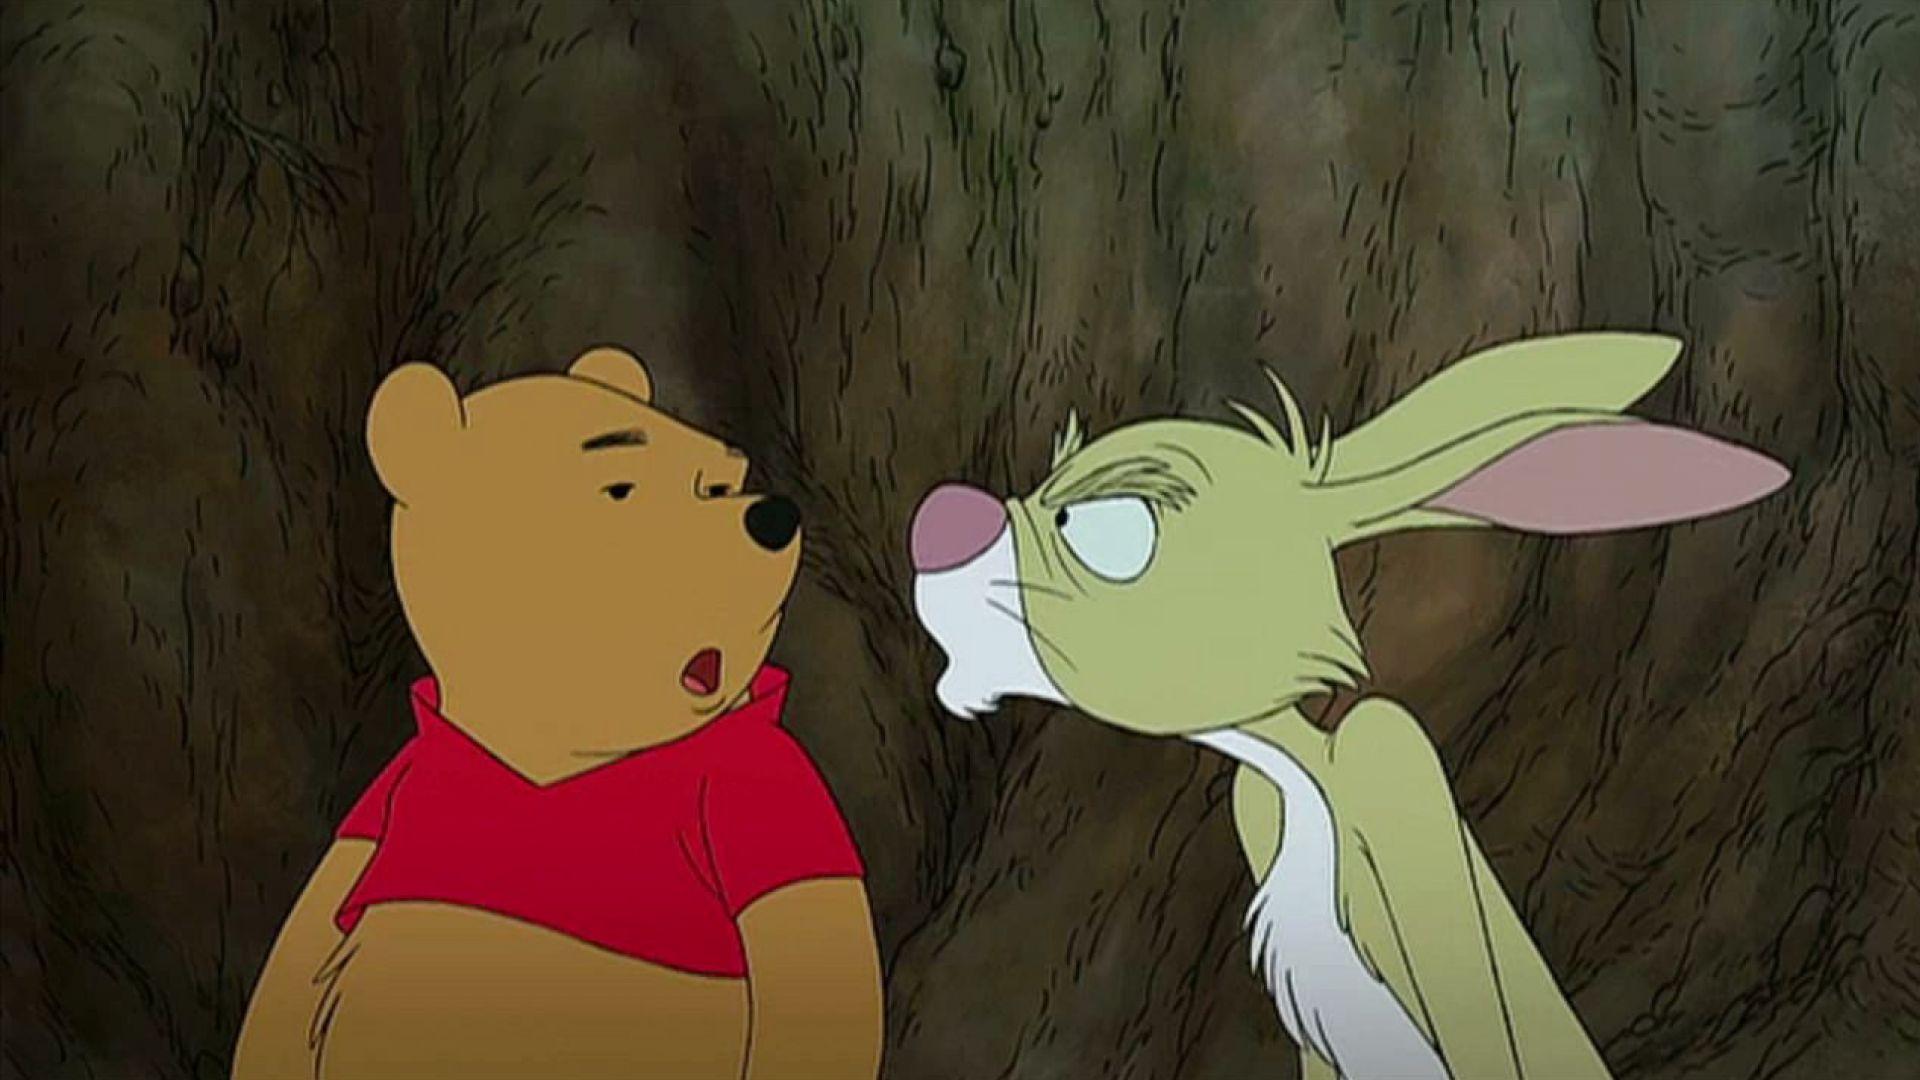 Send the pig! Winnie the Pooh